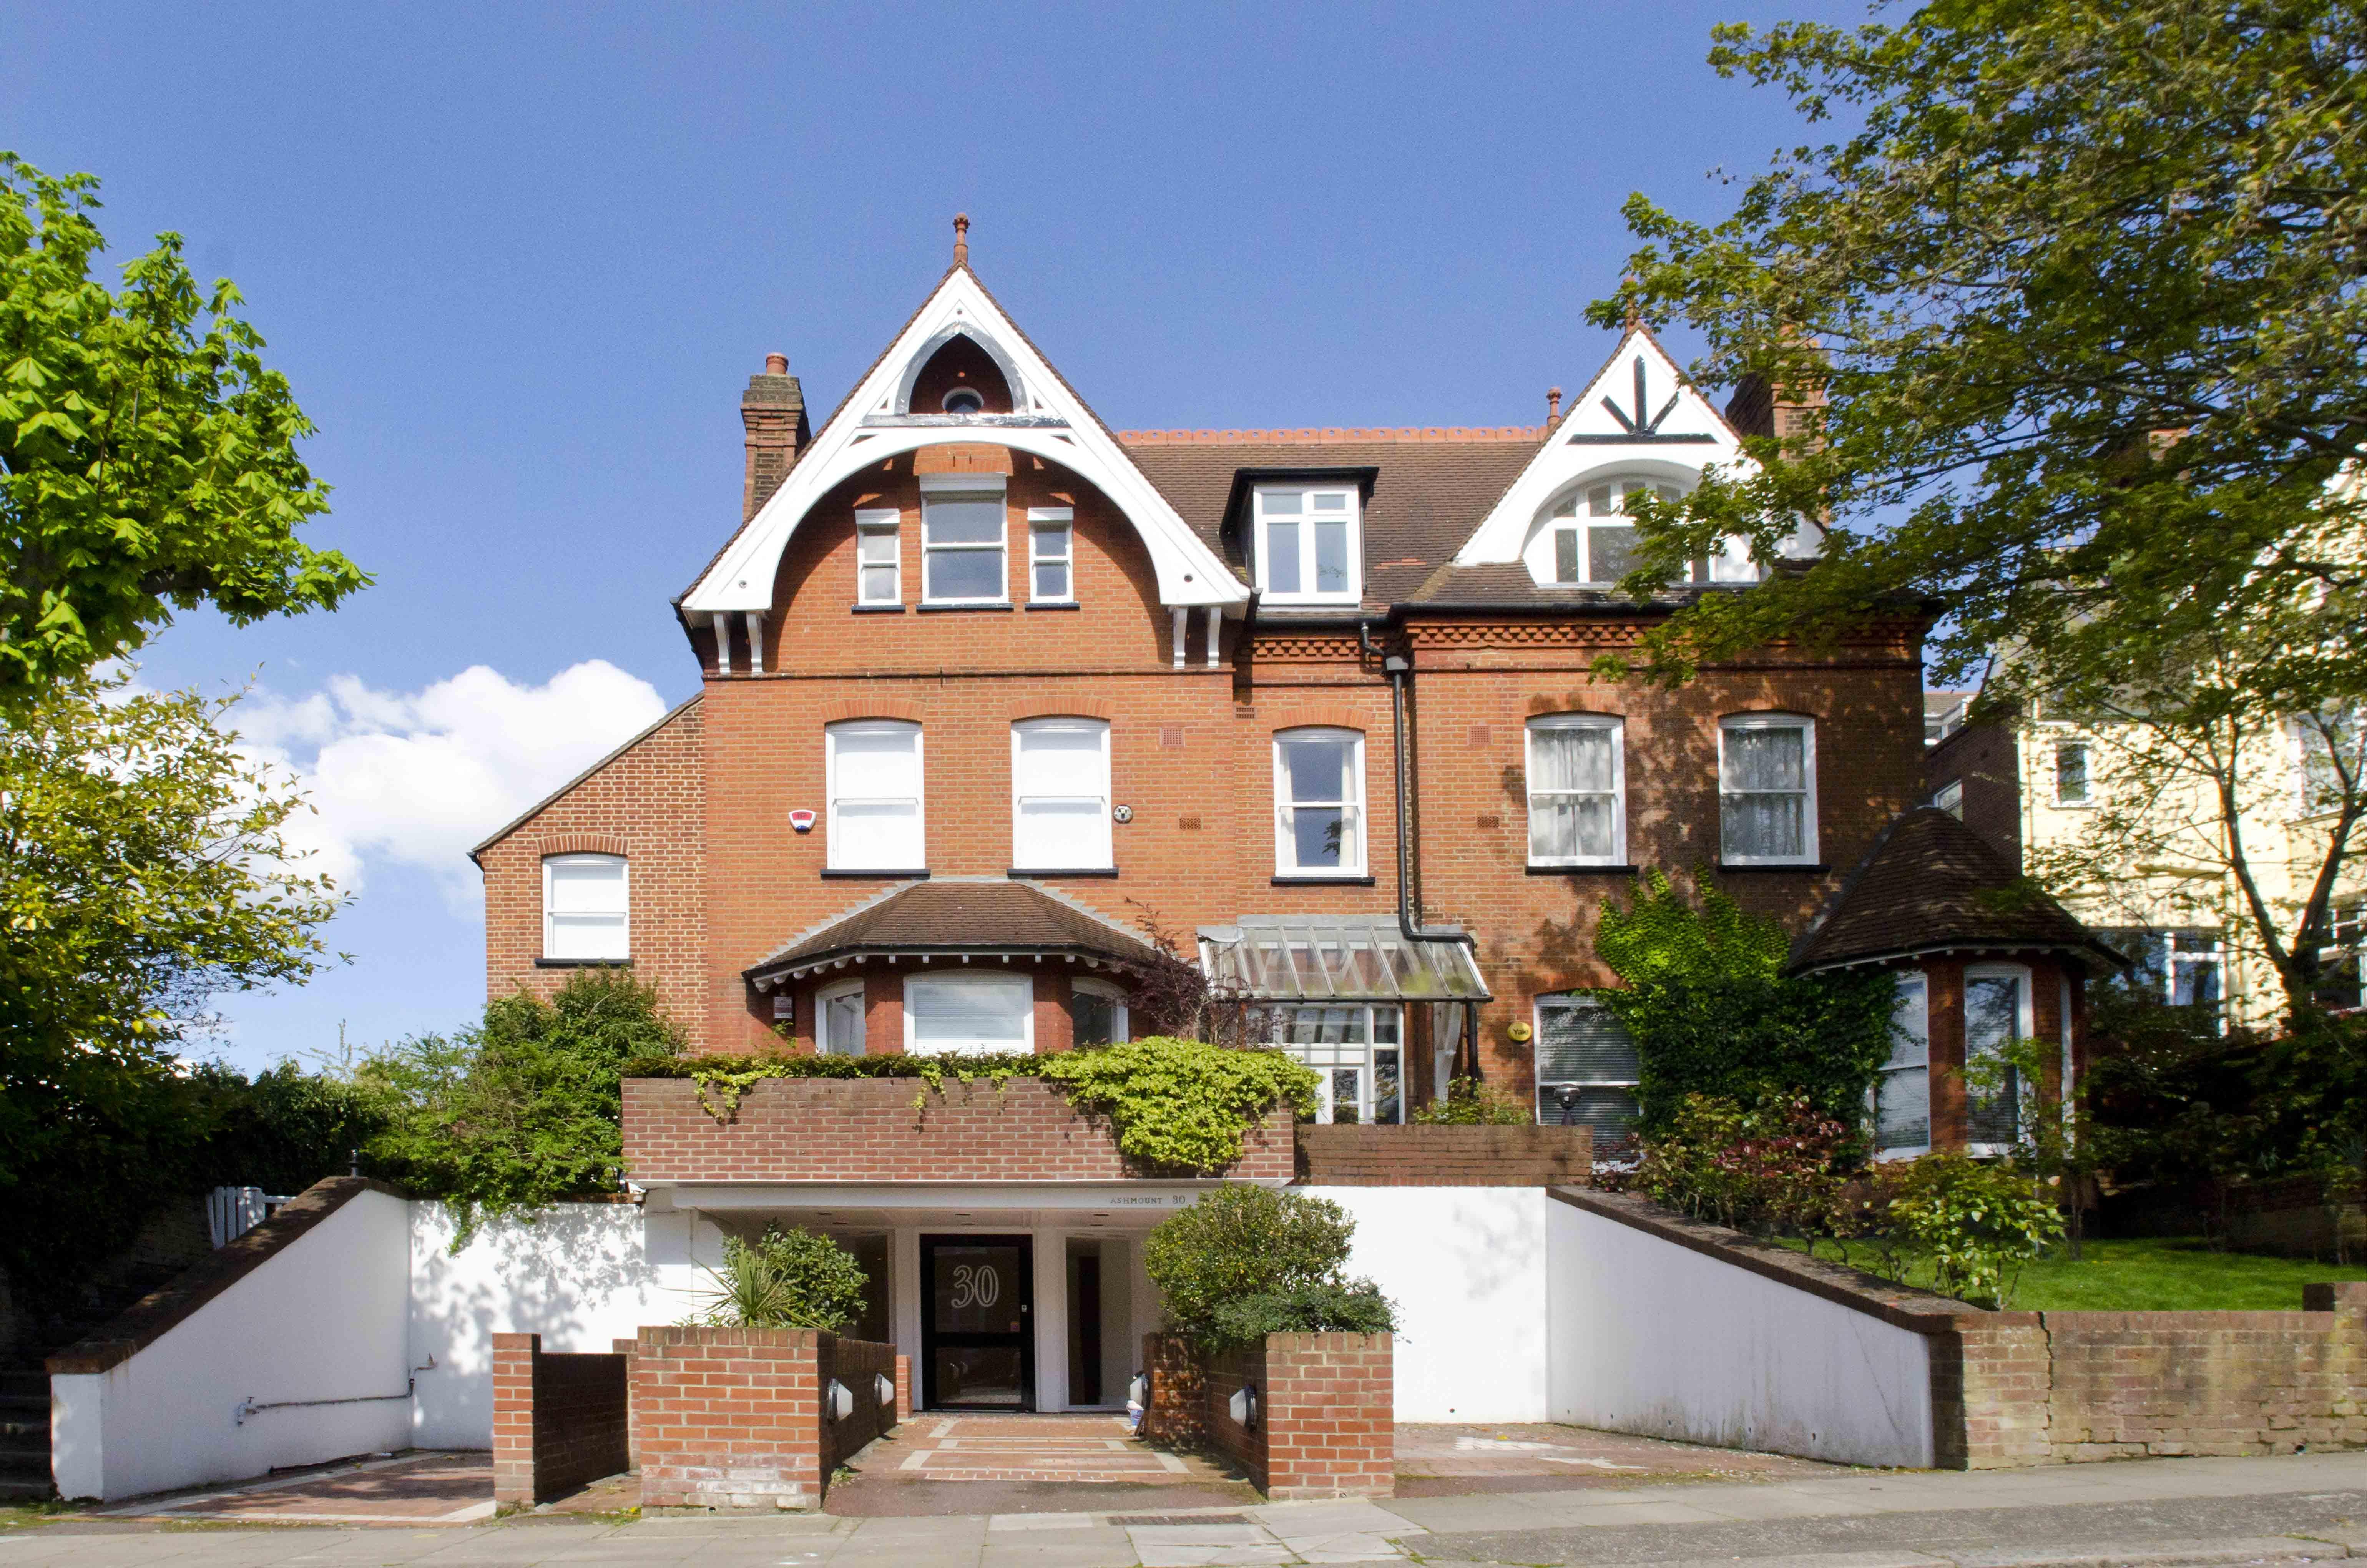 Redington Road, Hampstead, London, NW3